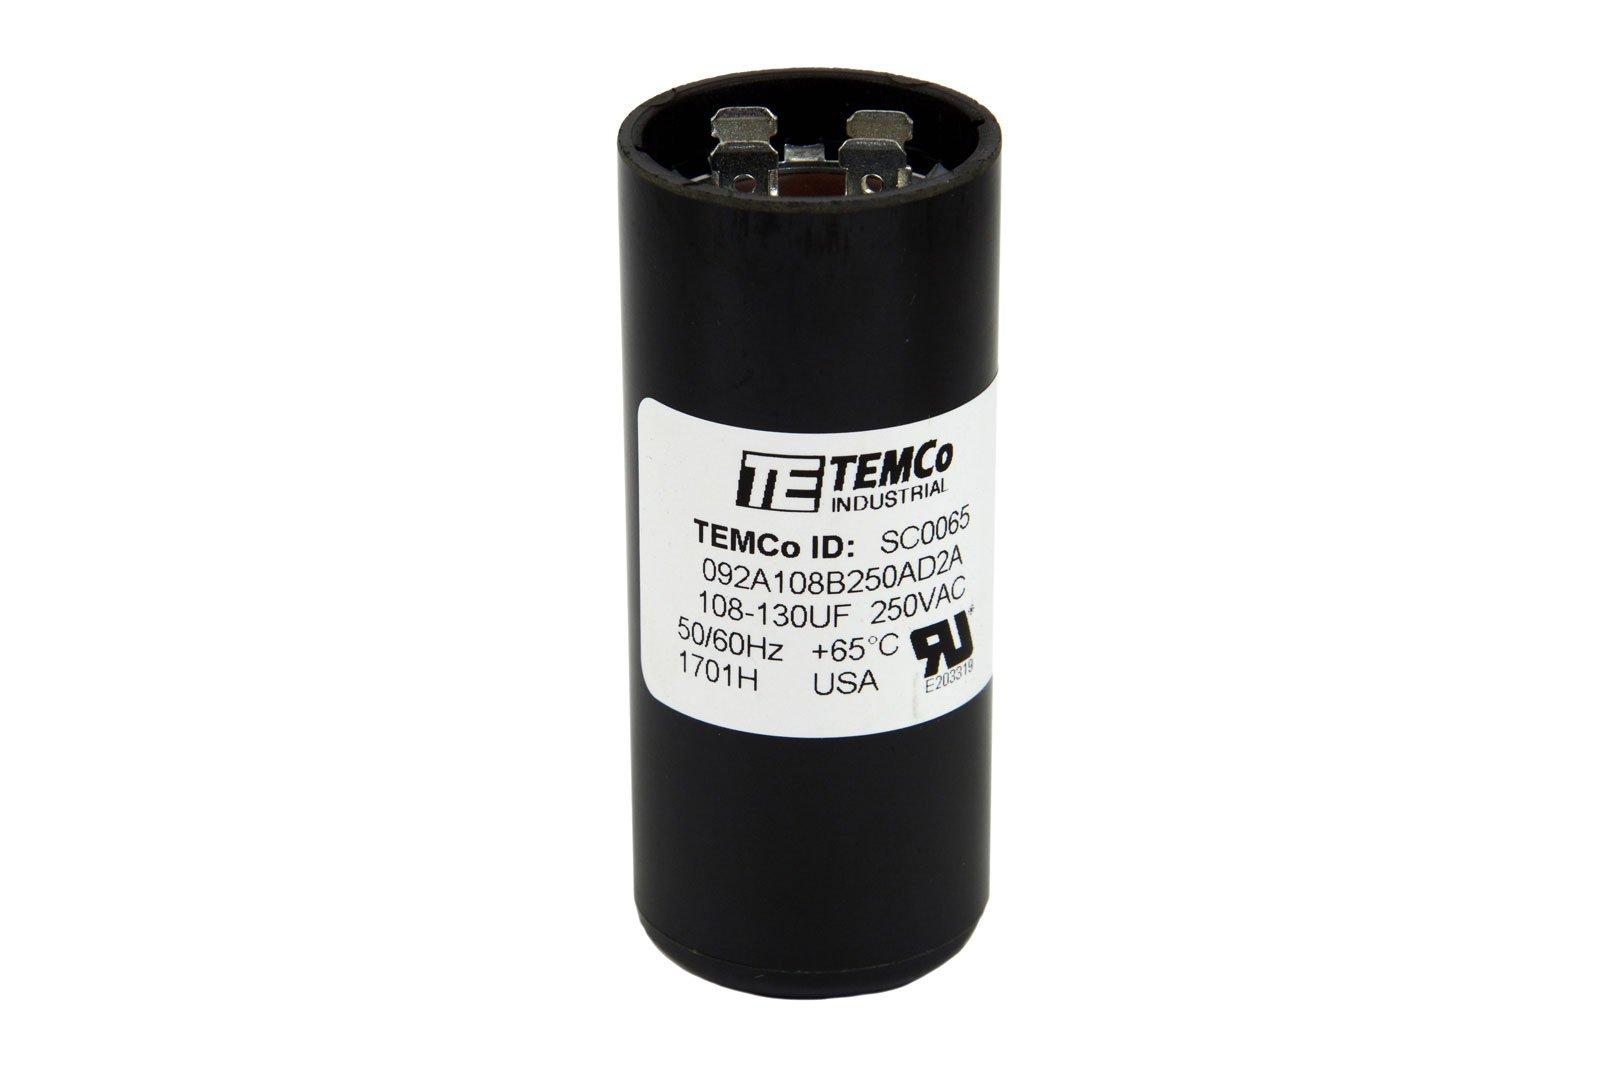 TEMCo Motor Start Capacitor SC0065-108-130 mfd 220-250 V VAC Volt uf Round HVAC AC Electric